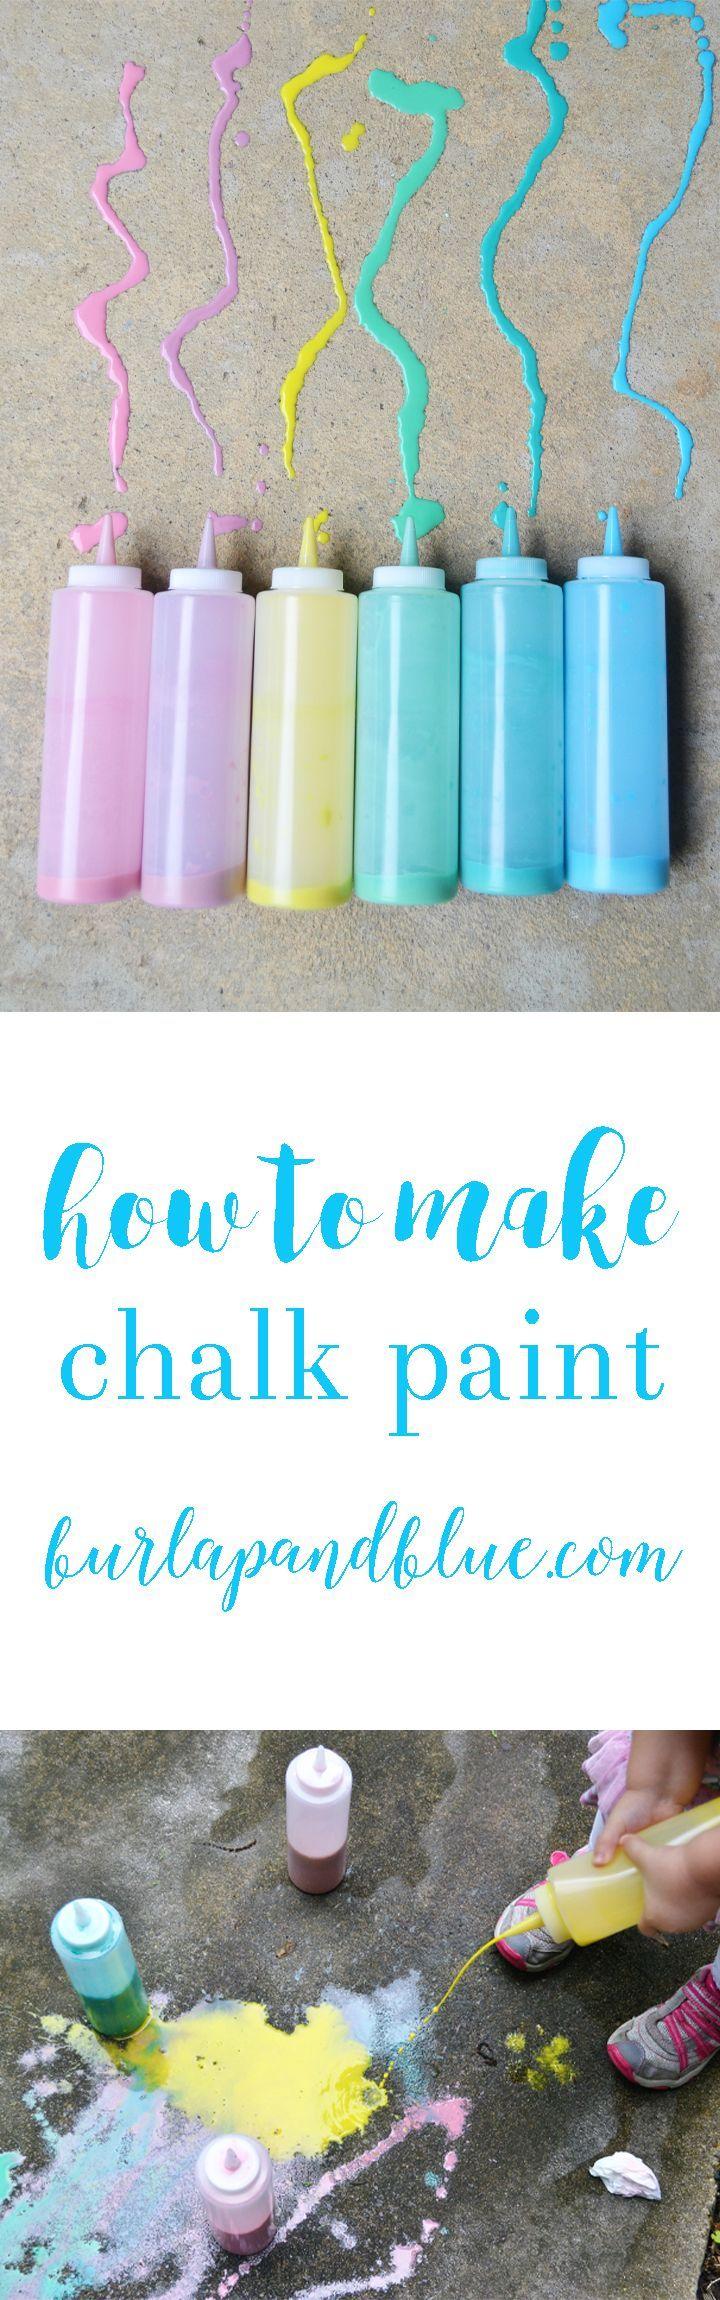 homemade sidewalk chalk paint! the perfect summer activity for kids! #HugtheMess #cbias #ad